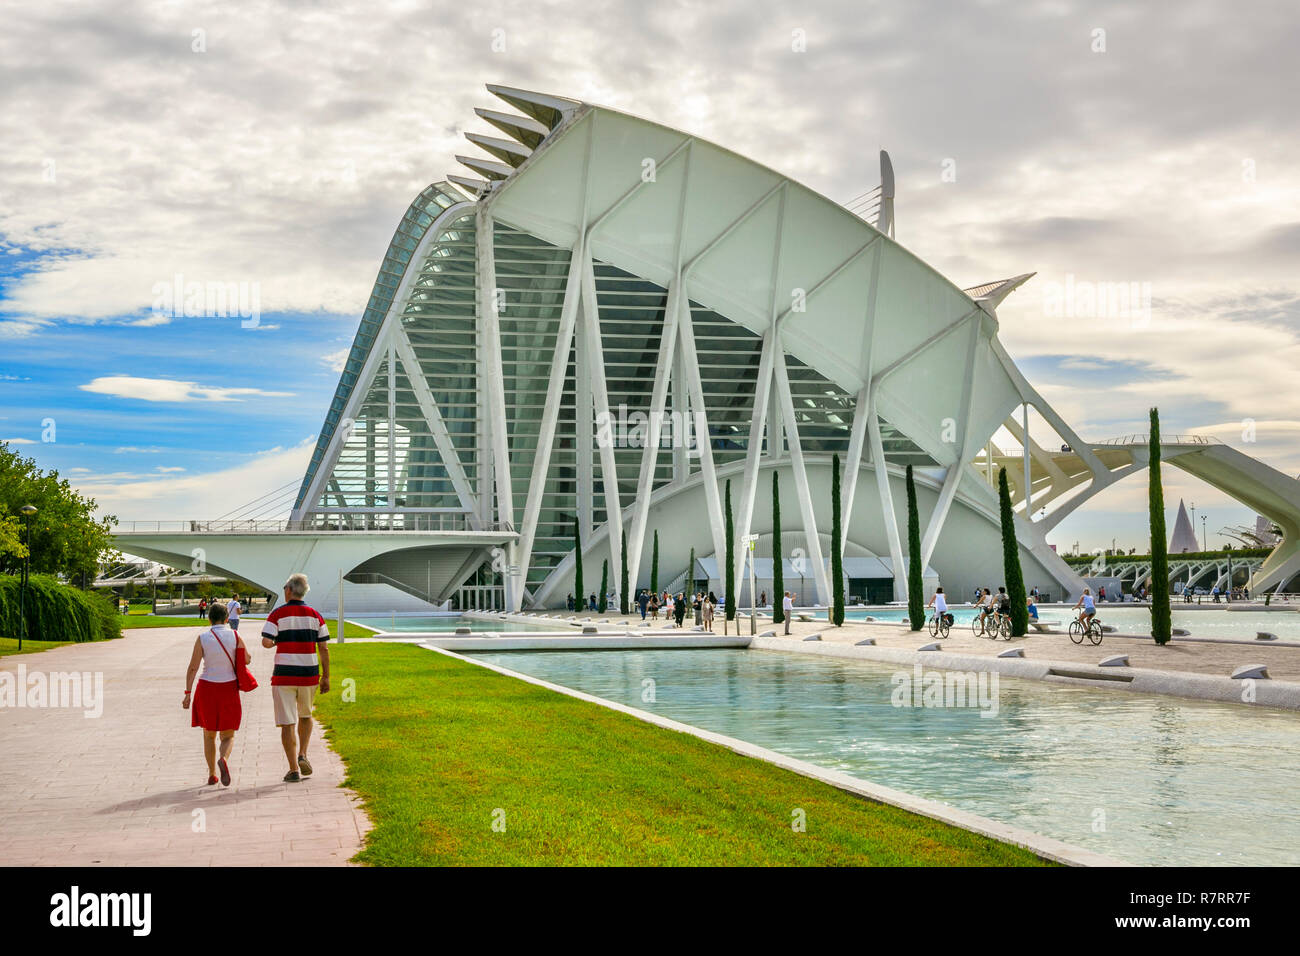 Principe Felipe Science Museum. City of Arts and Sciences .Architect Santiago Calatrava and Felix Candela. Valencia. Comunidad Valencia. Spain. Europe - Stock Image